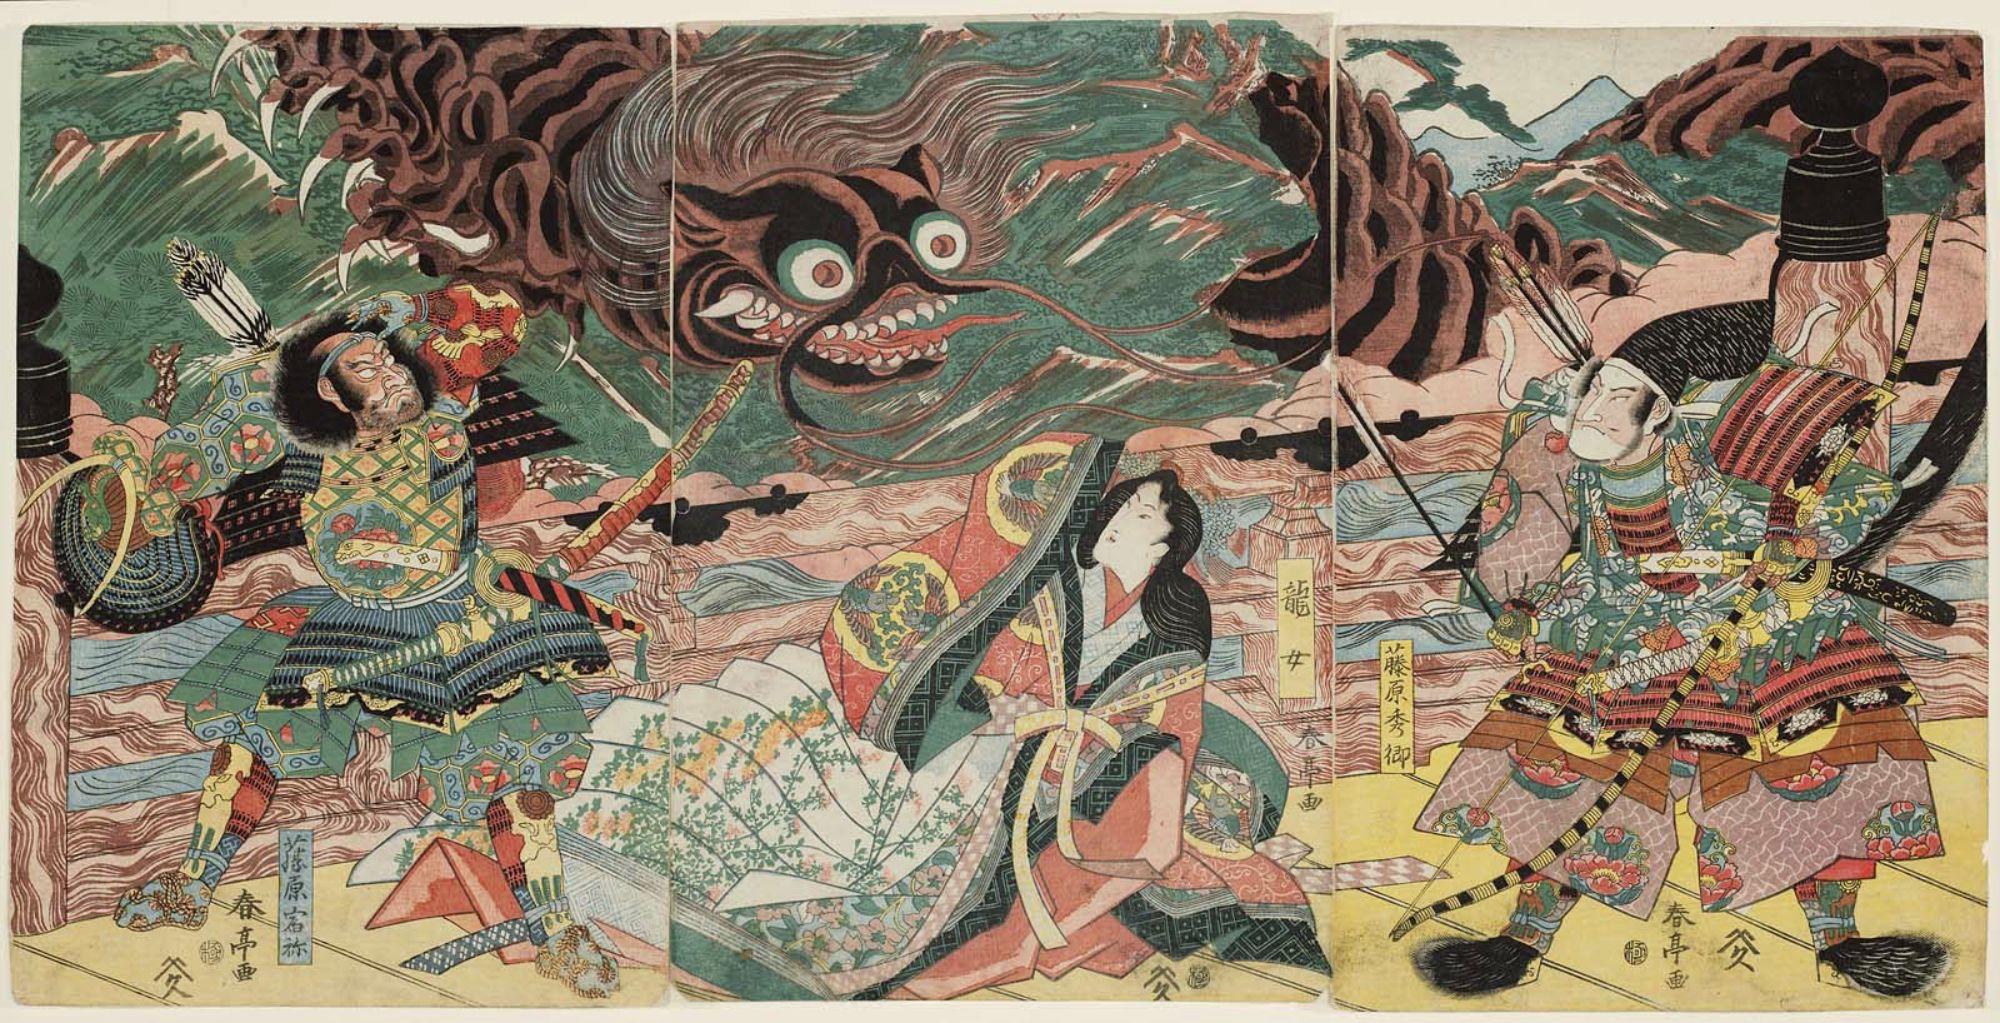 Japanese Ukiyo-e Woodblock Print Book 5-585UtagawaToyokuni Around 1881